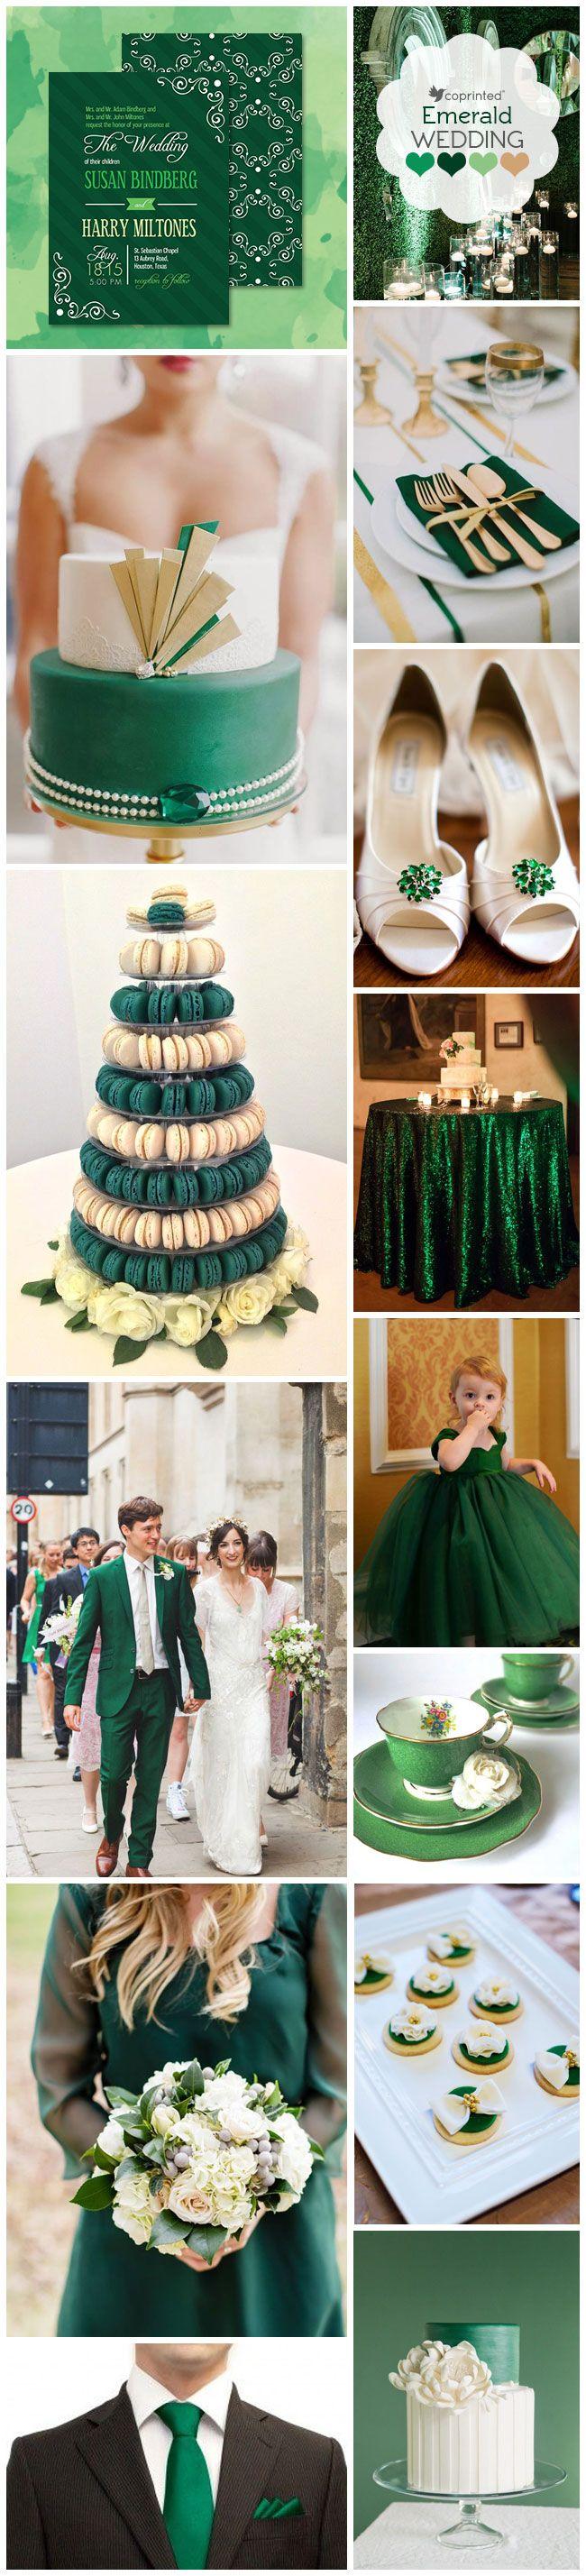 Inspiration Board using Emerald Green Wedding Invitations